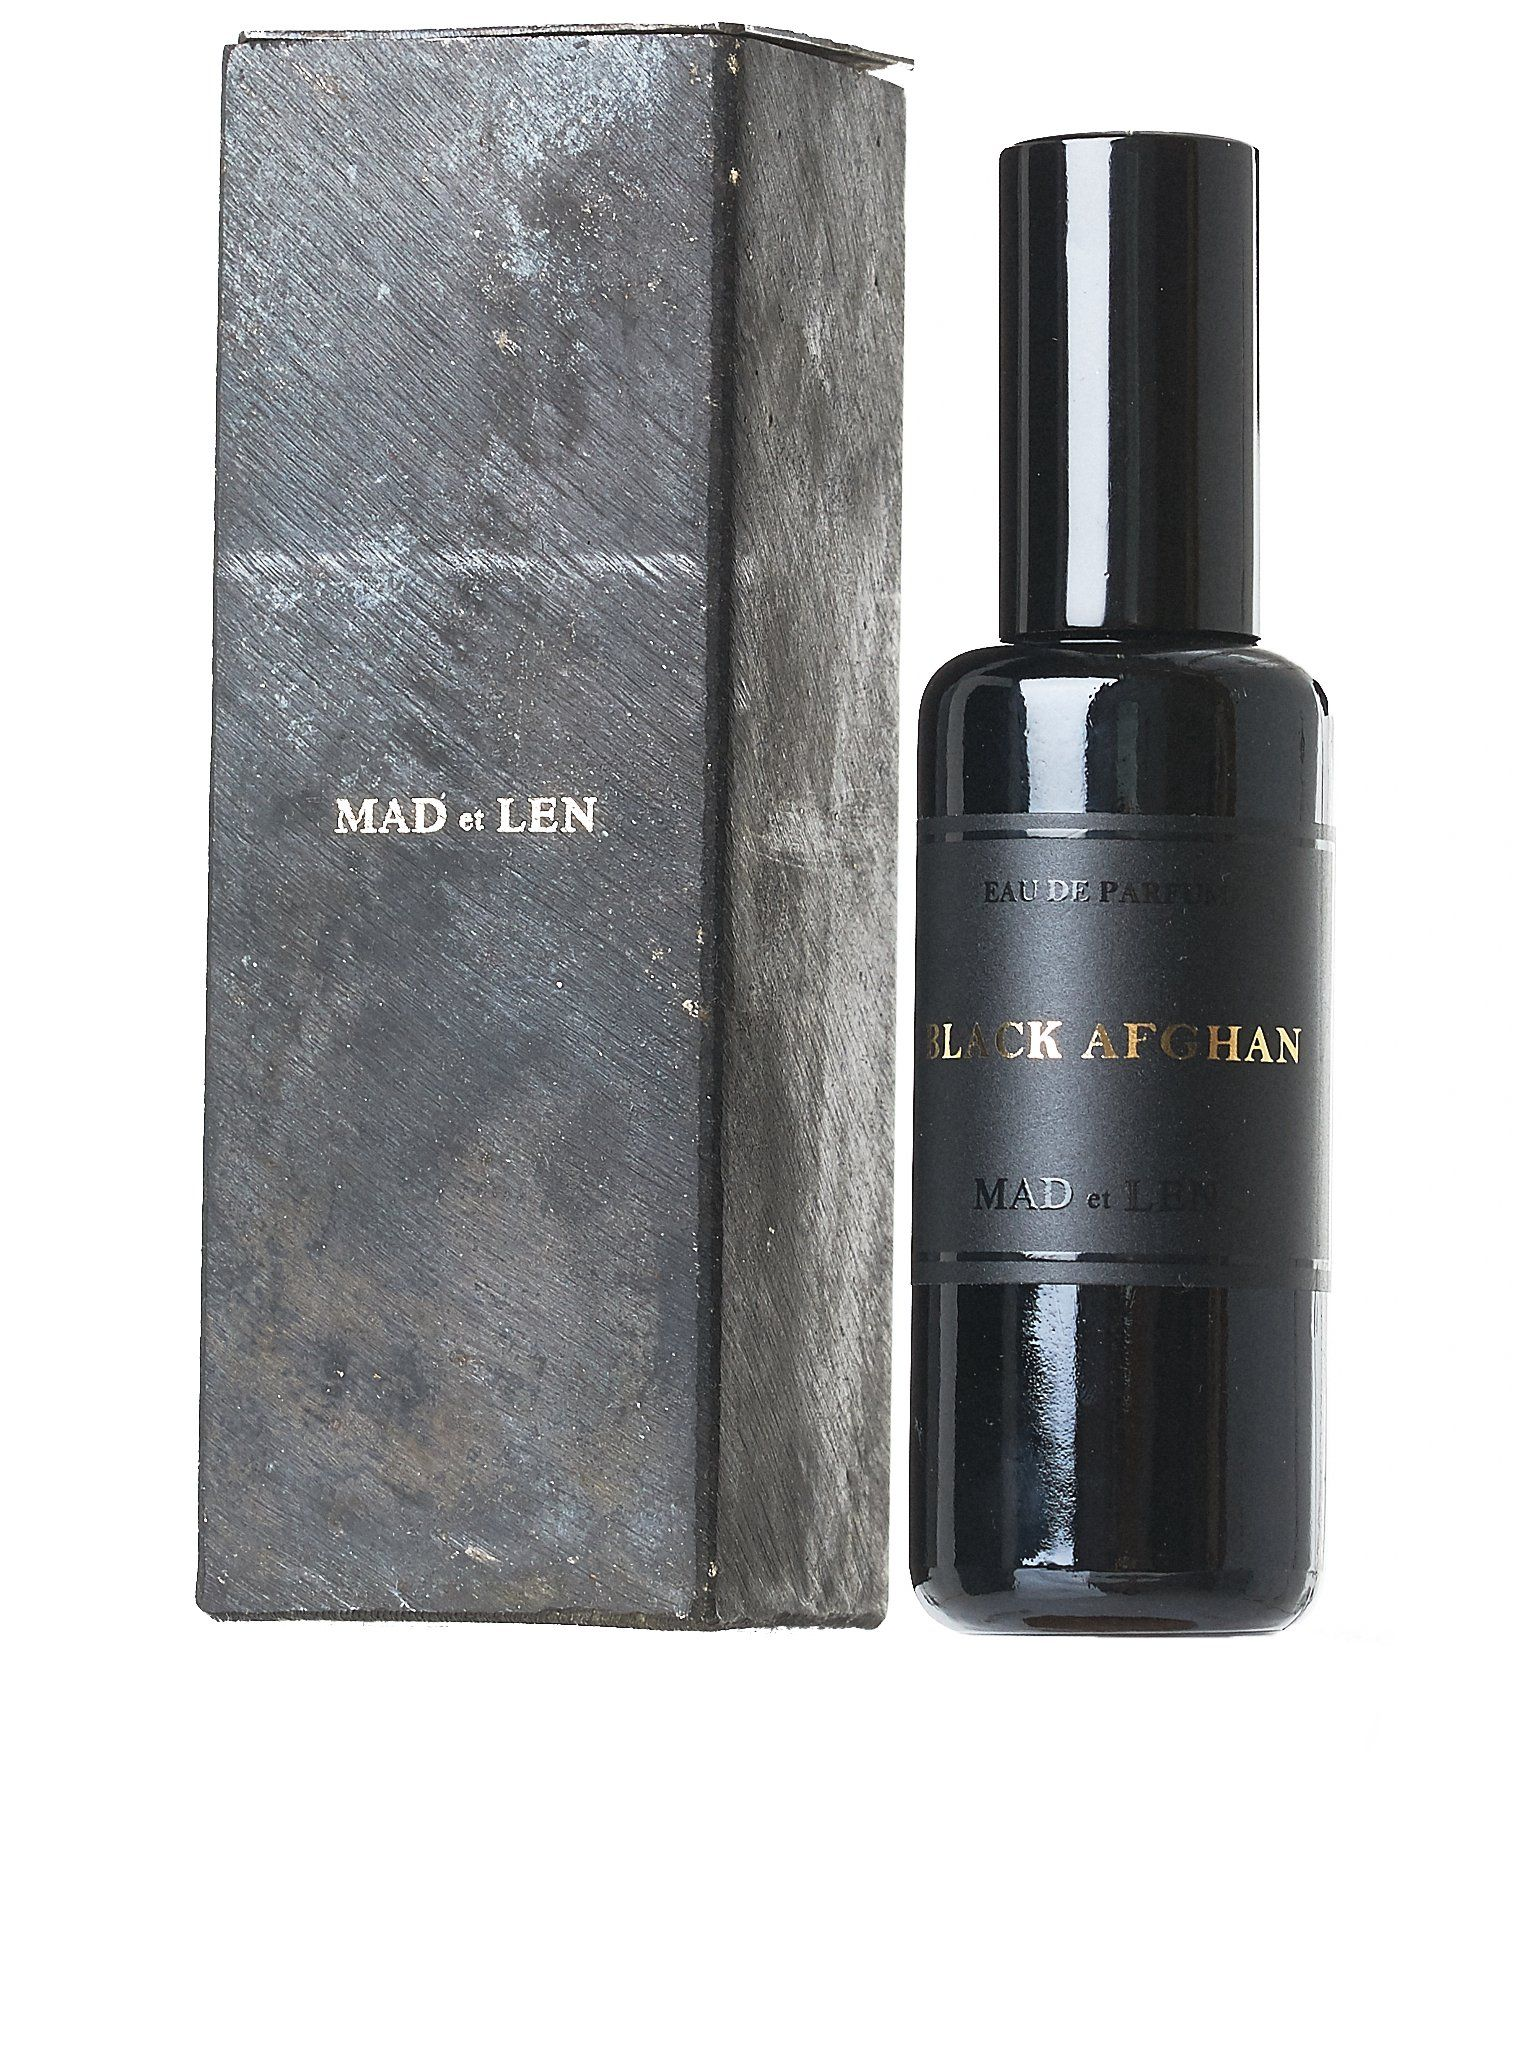 Mad Et Len Black Afghan Perfume Black Perfume Perfume